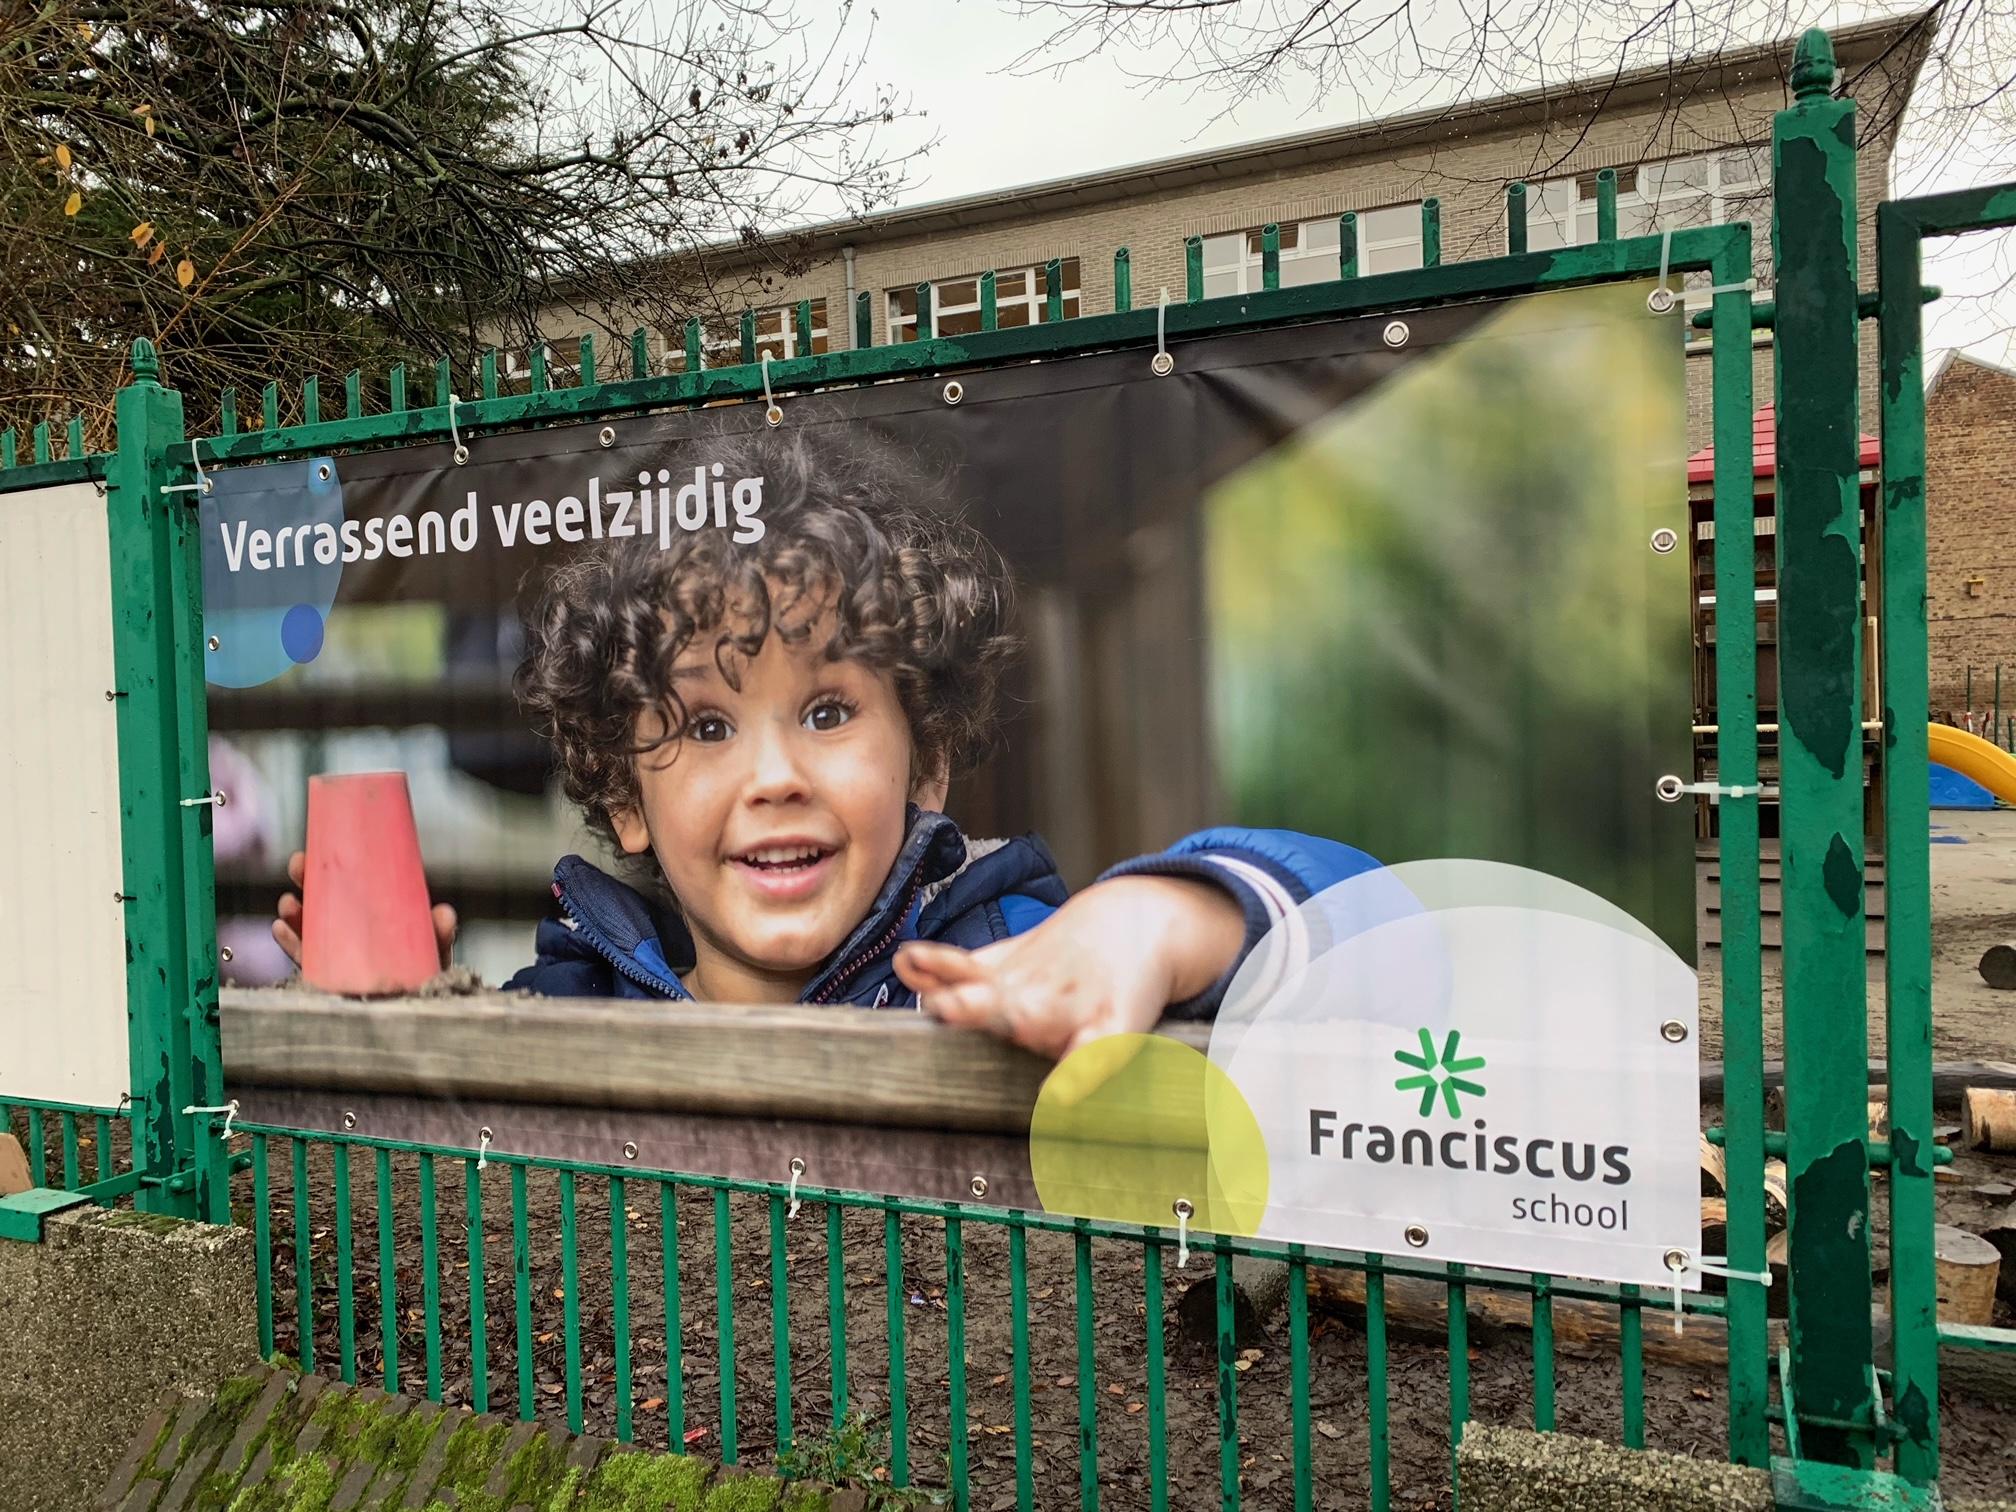 Franciscusschool - Borgerhout